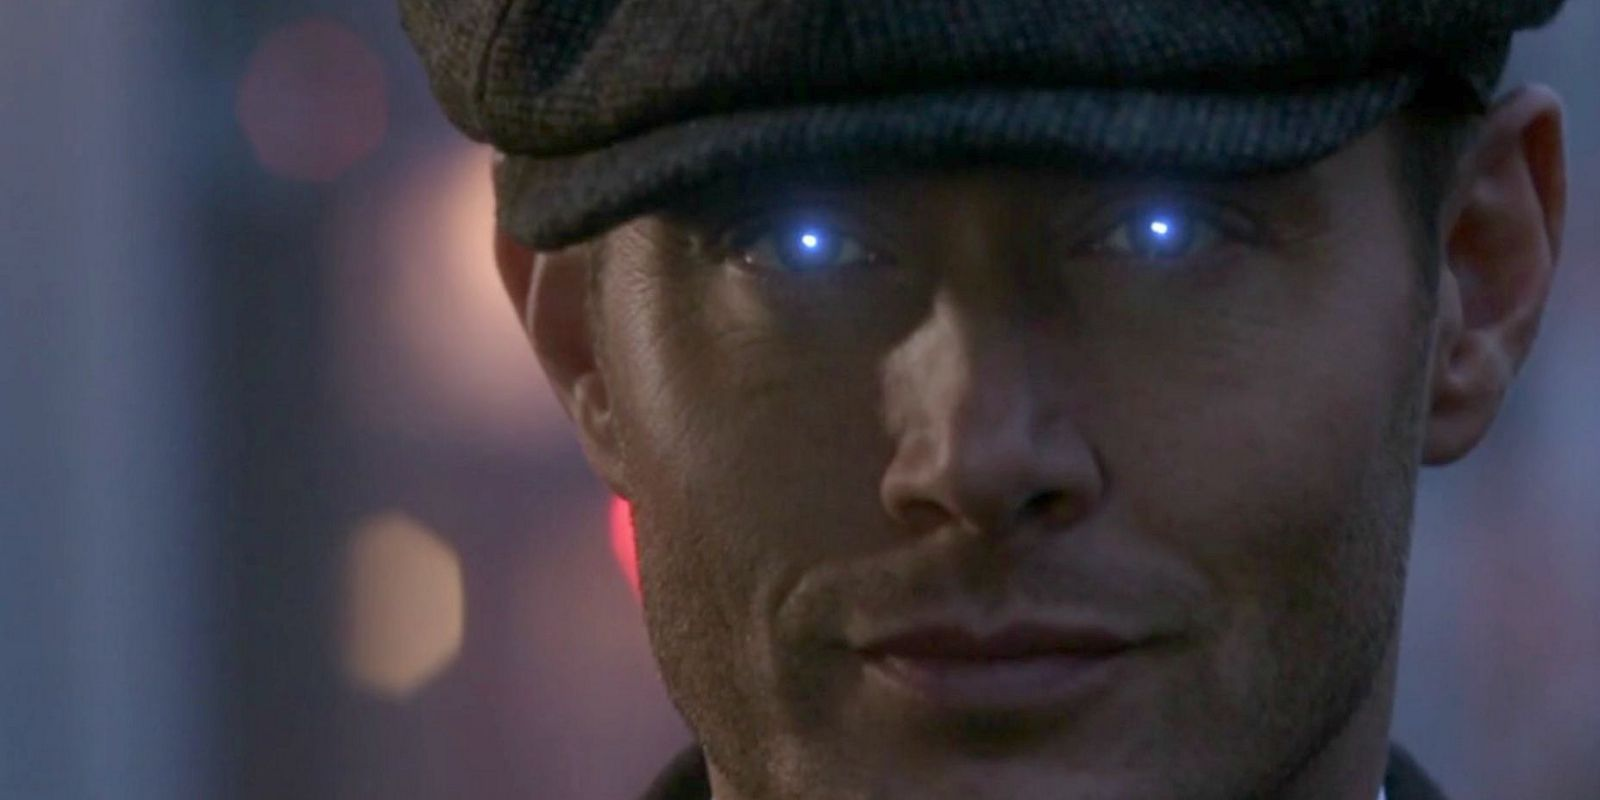 supernatural season 14 first look reveals michael�s